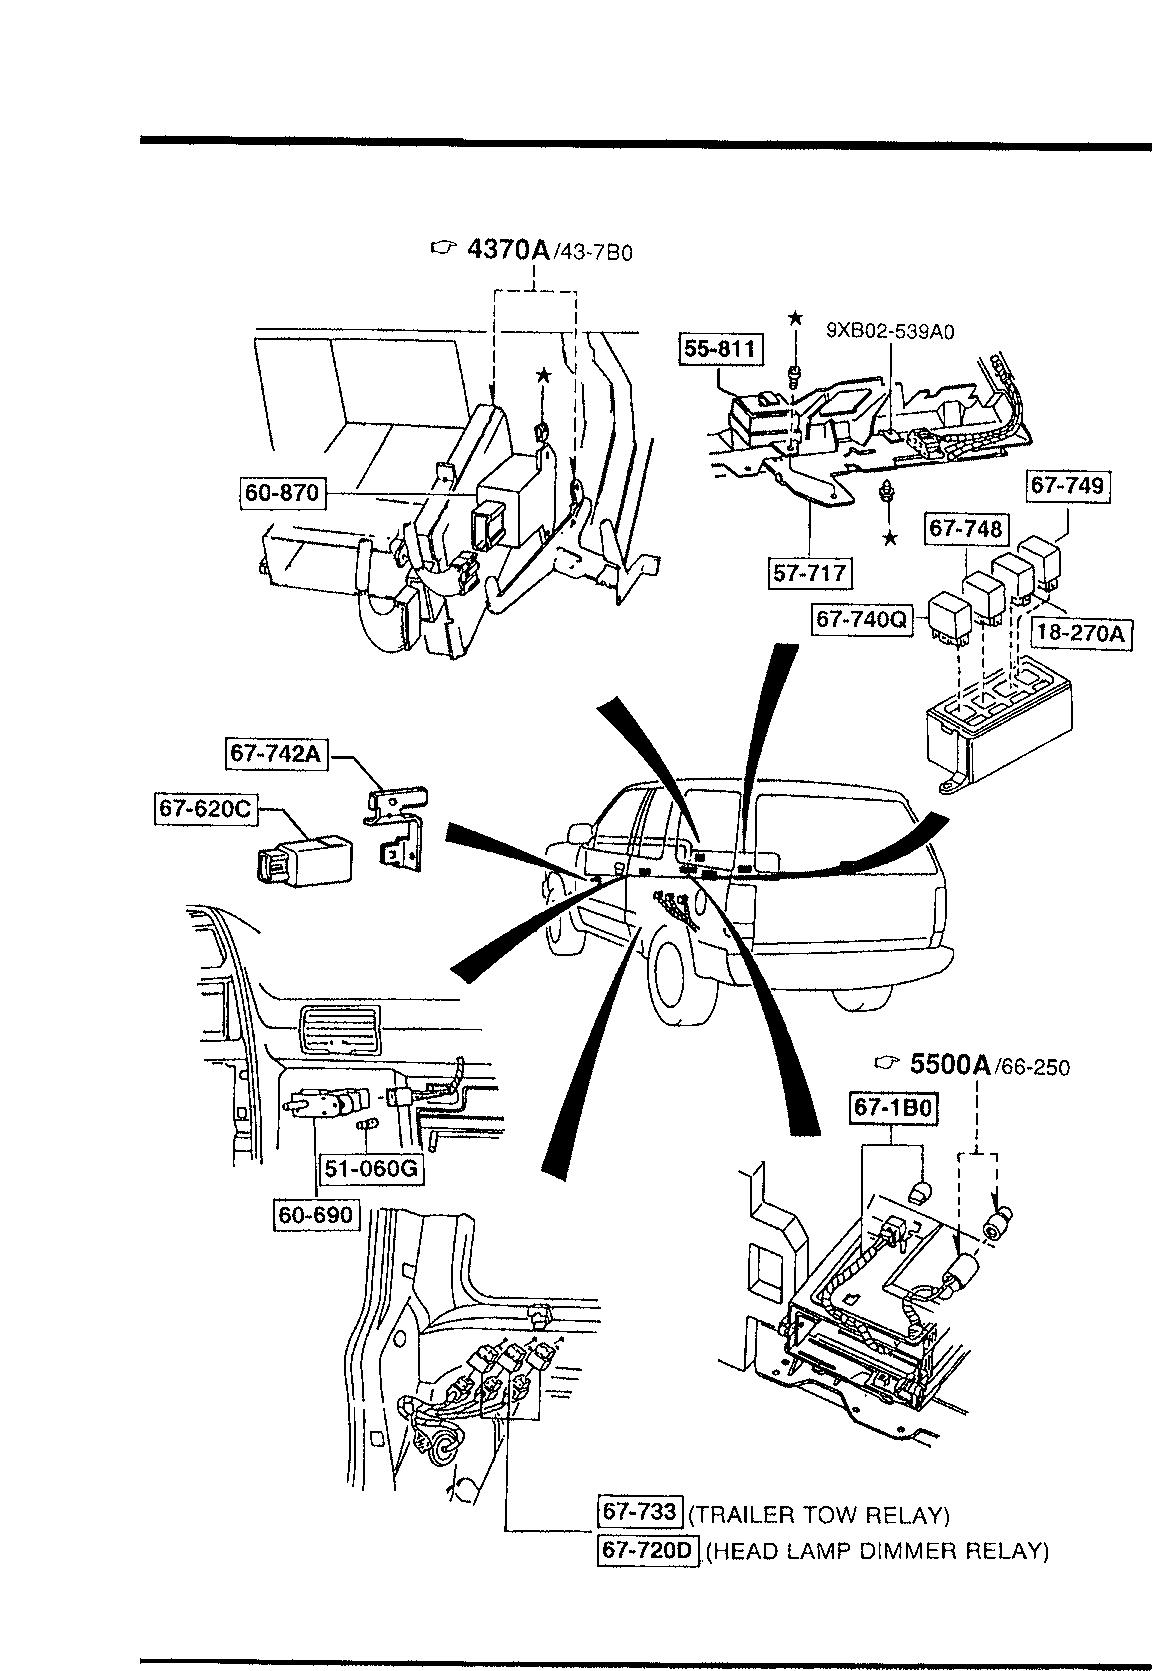 34 Foab 14b192 Aa Relay Diagram